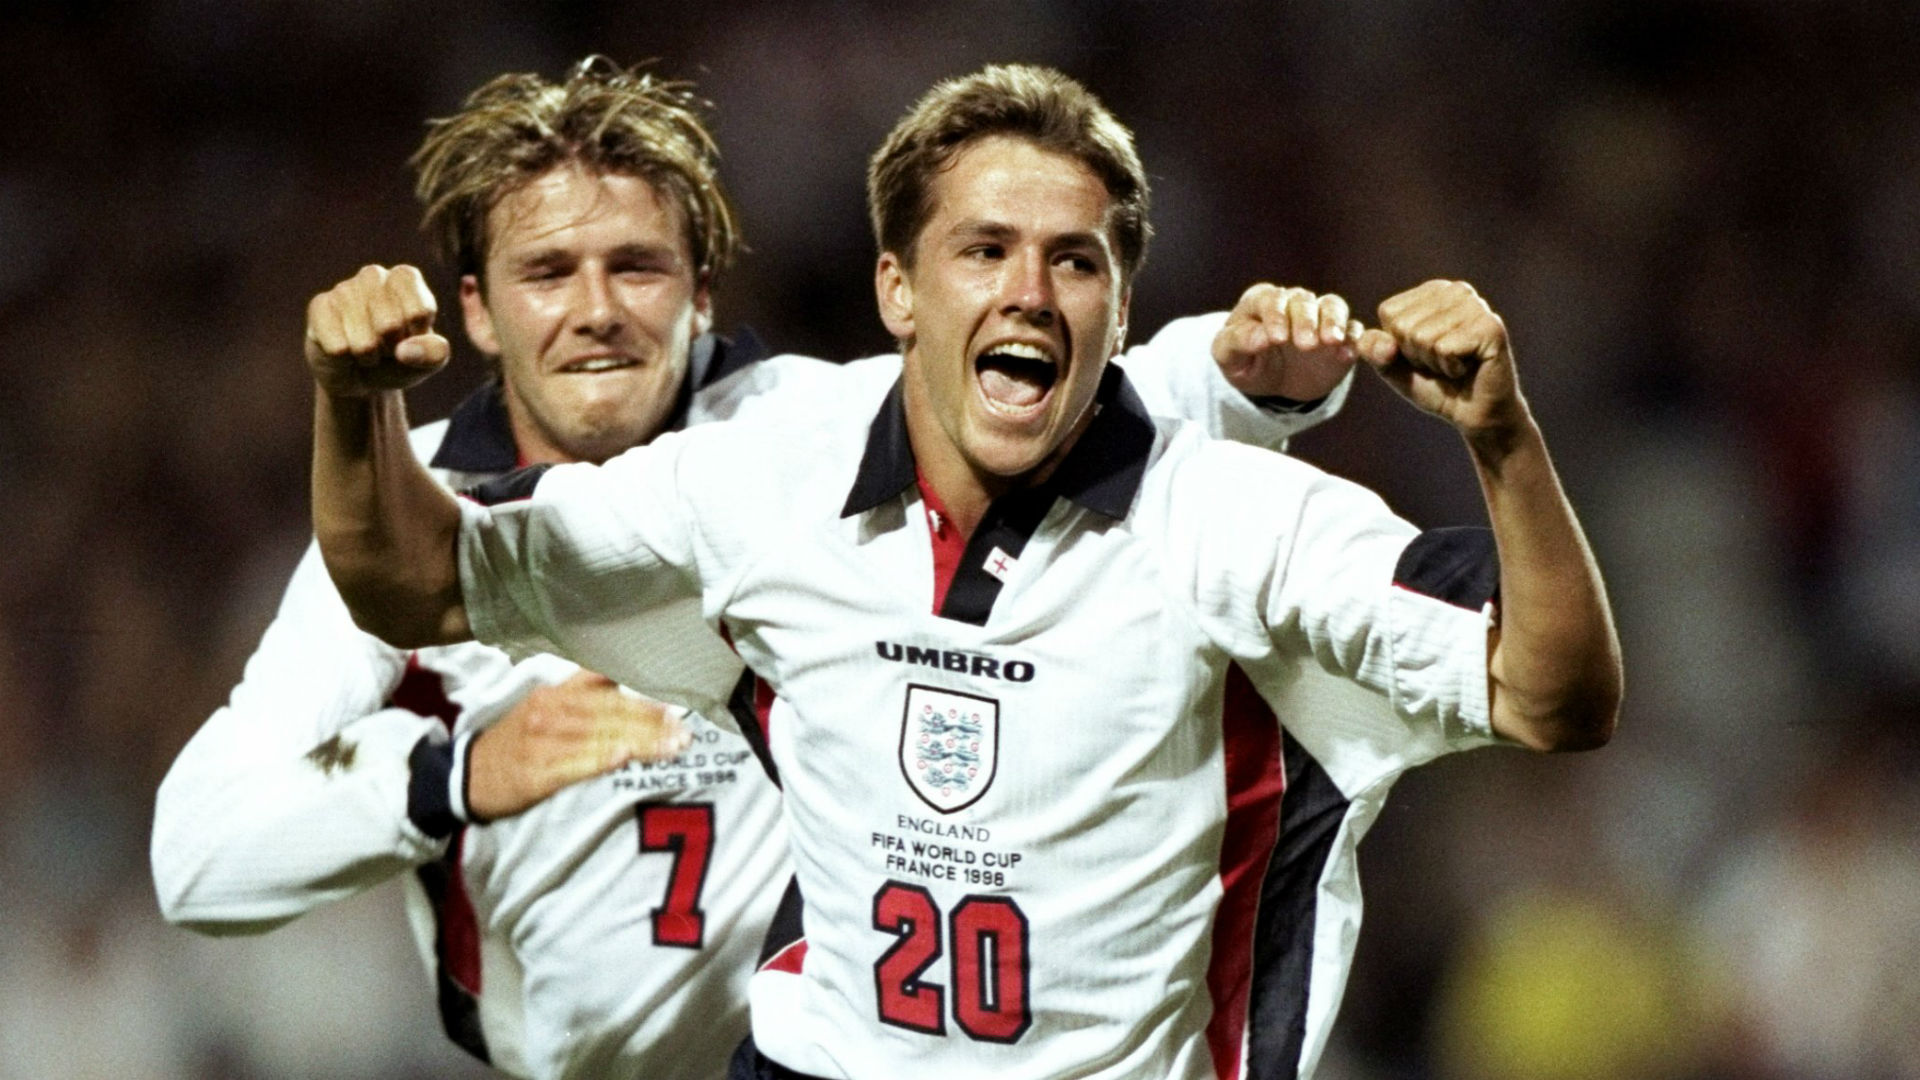 World Cup 1998 Merson 15 England Home Football Name set for National shirt